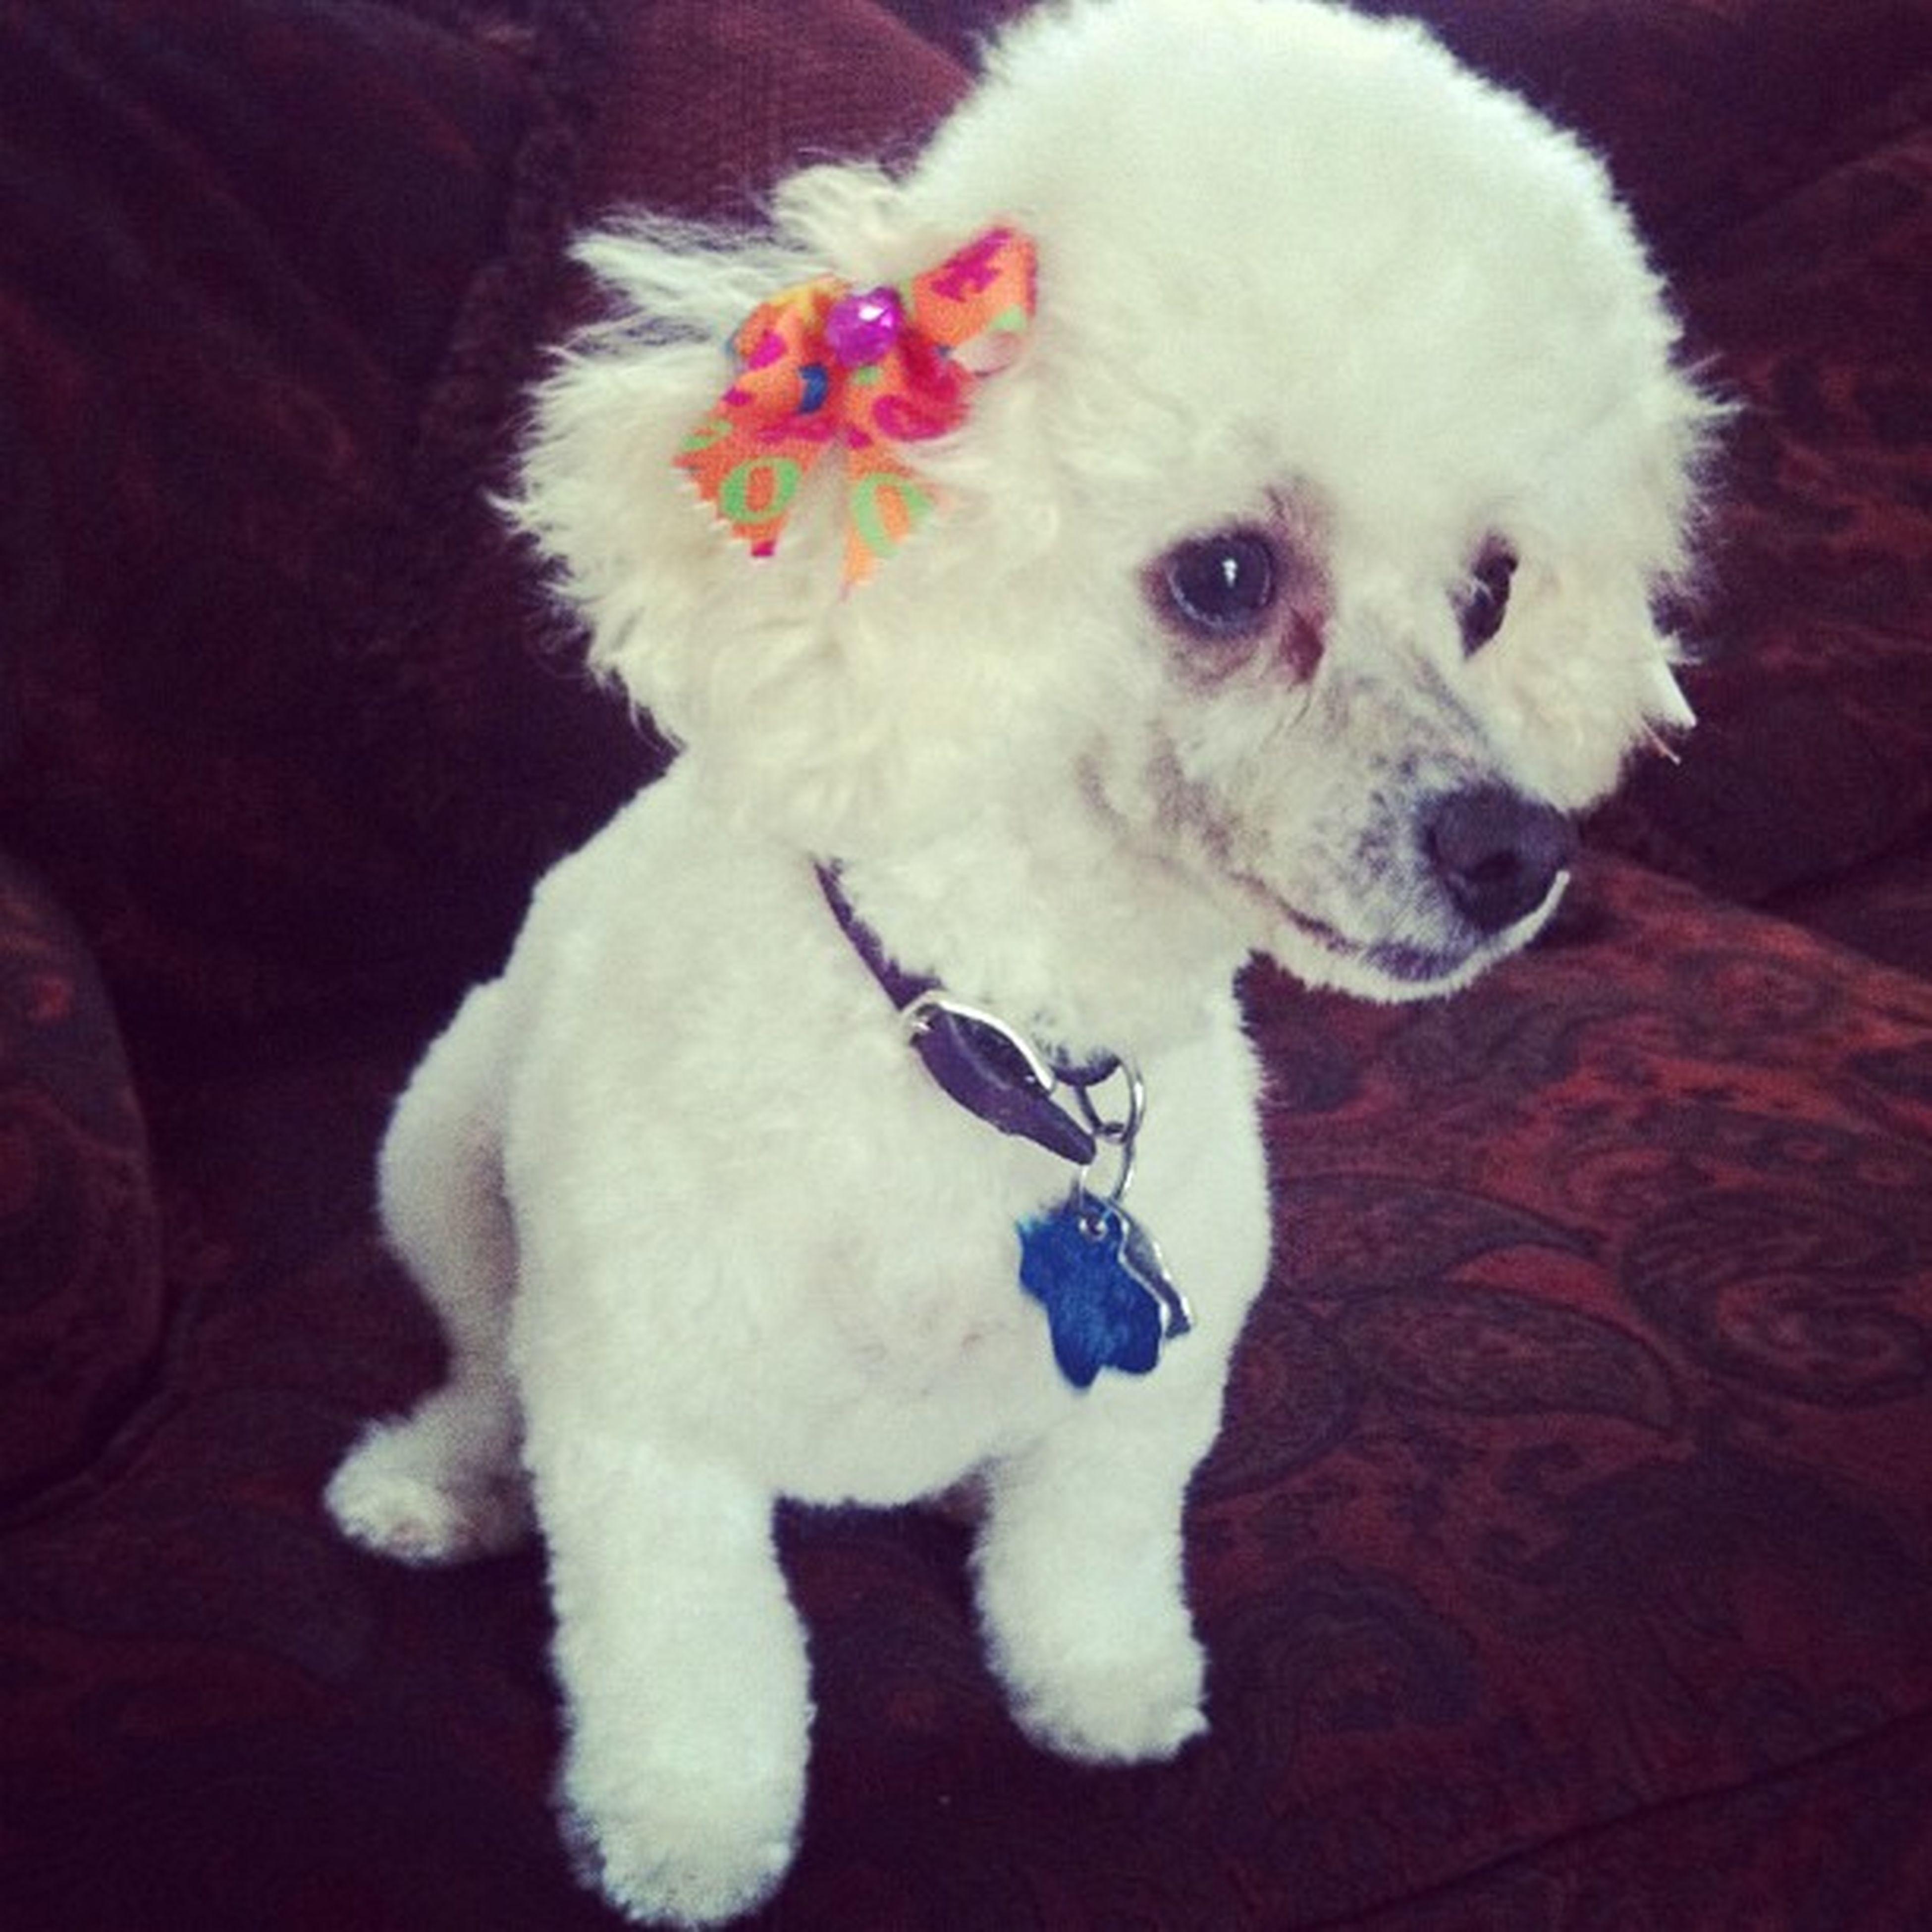 Justgroomed Poodle Shegotherhairdid